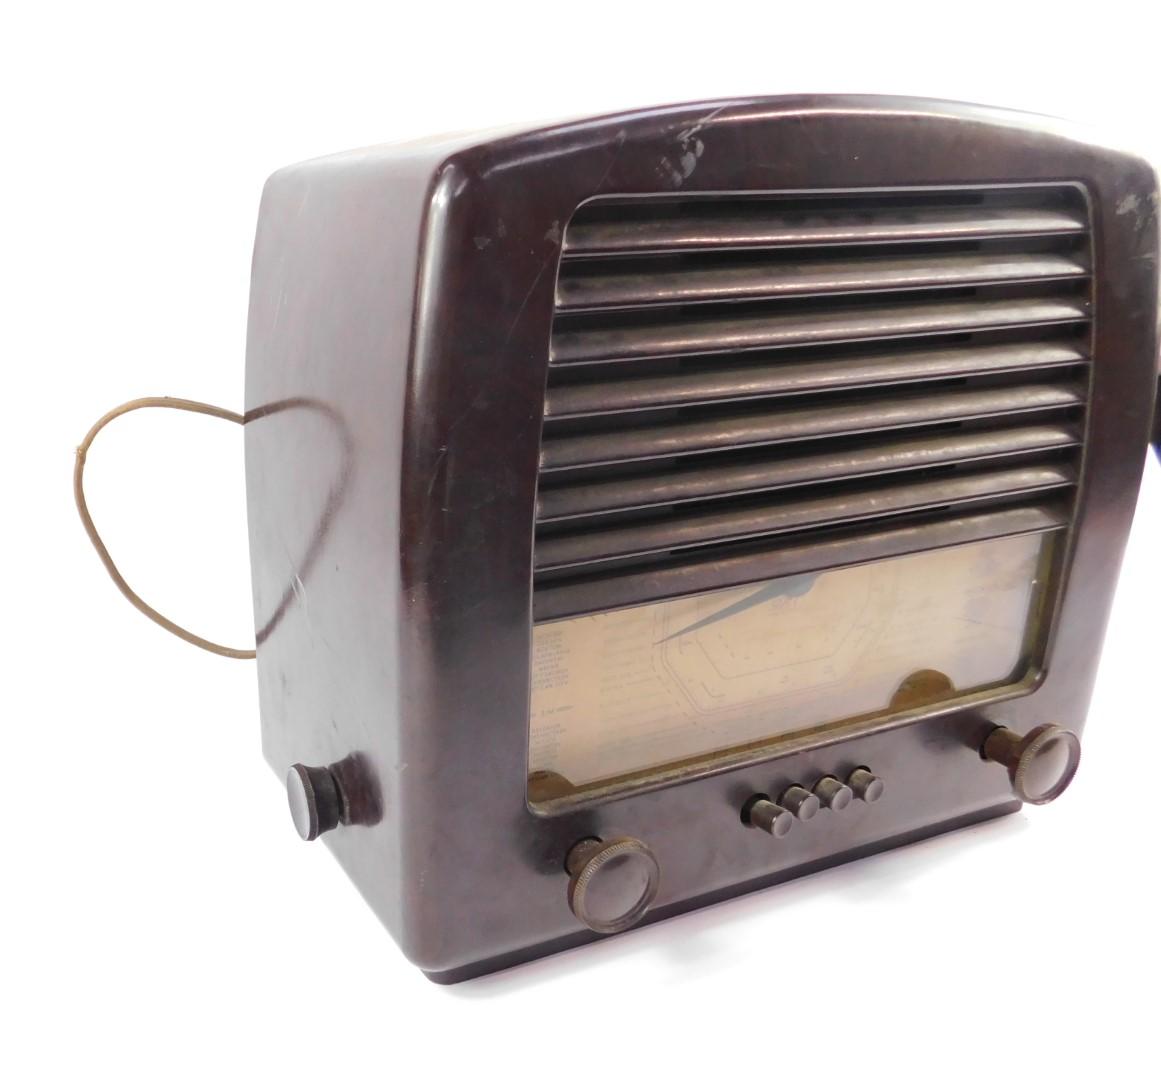 A GEC brown bakelite radio, Cat No BC4650L, Inst. No KX1945, 34cm H, 37.5cm W. - Image 3 of 5